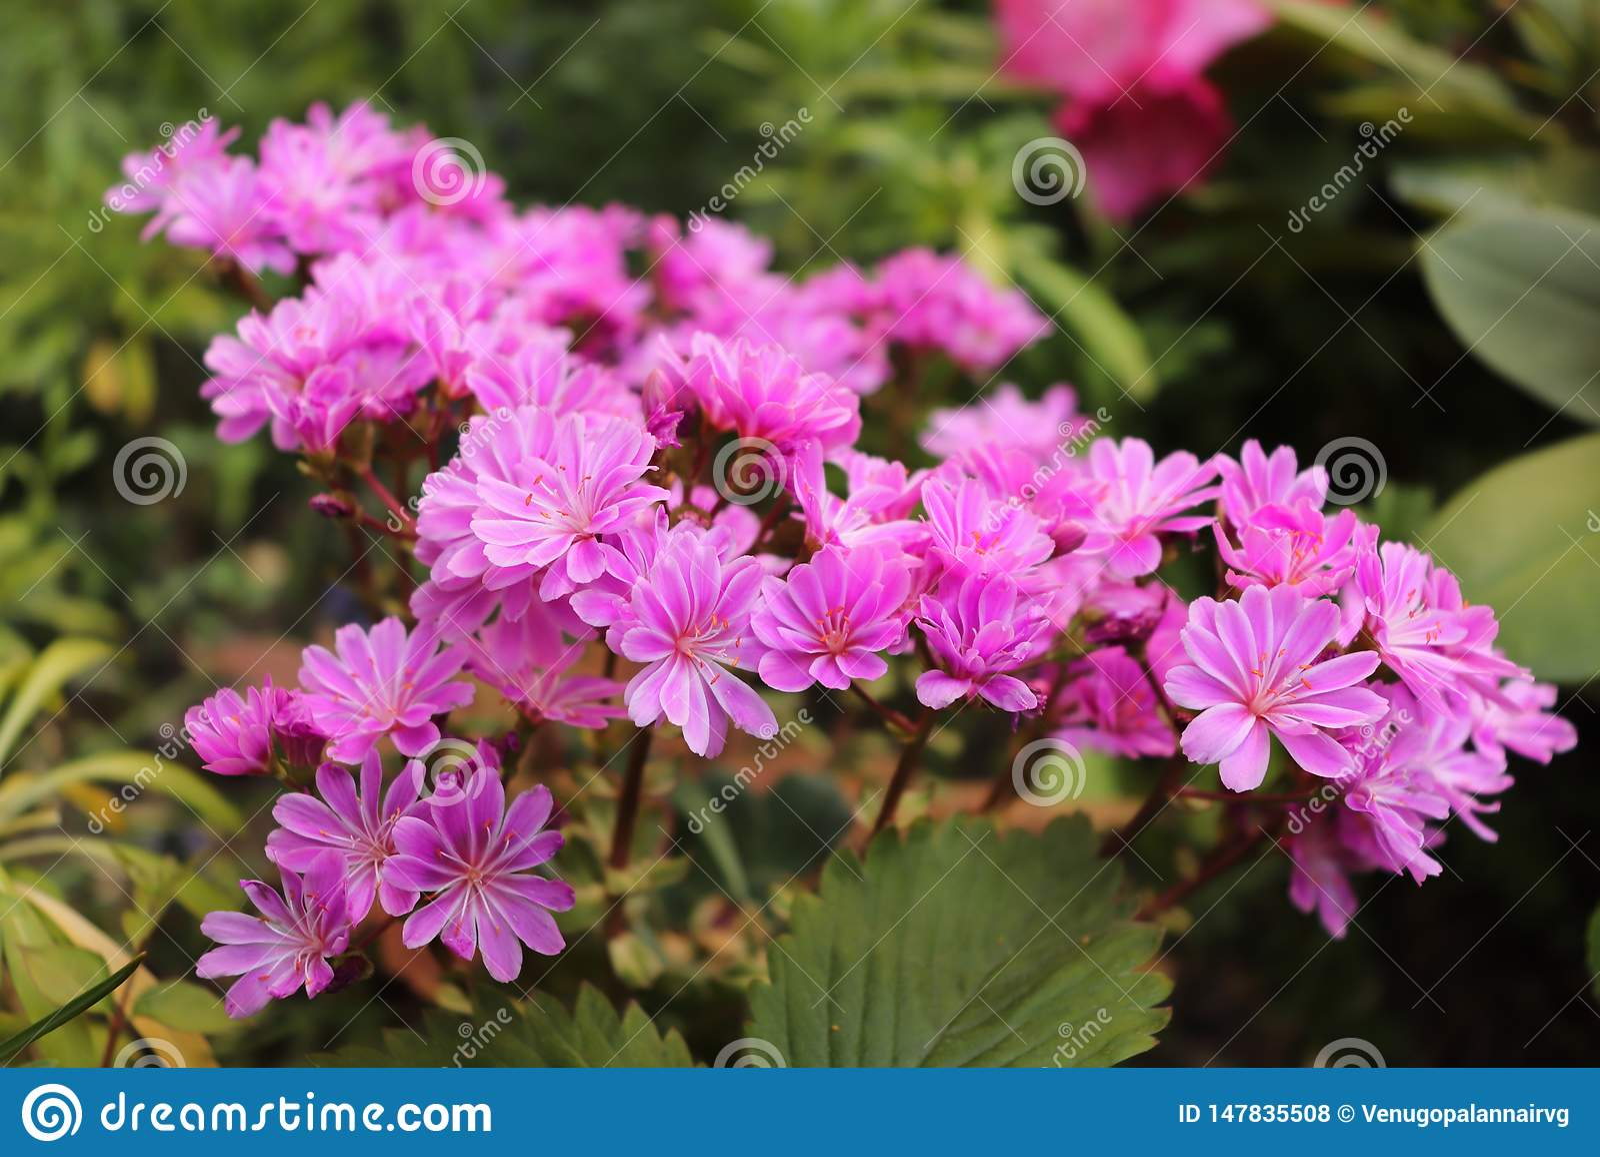 Пук маленьких пурпурных цветков